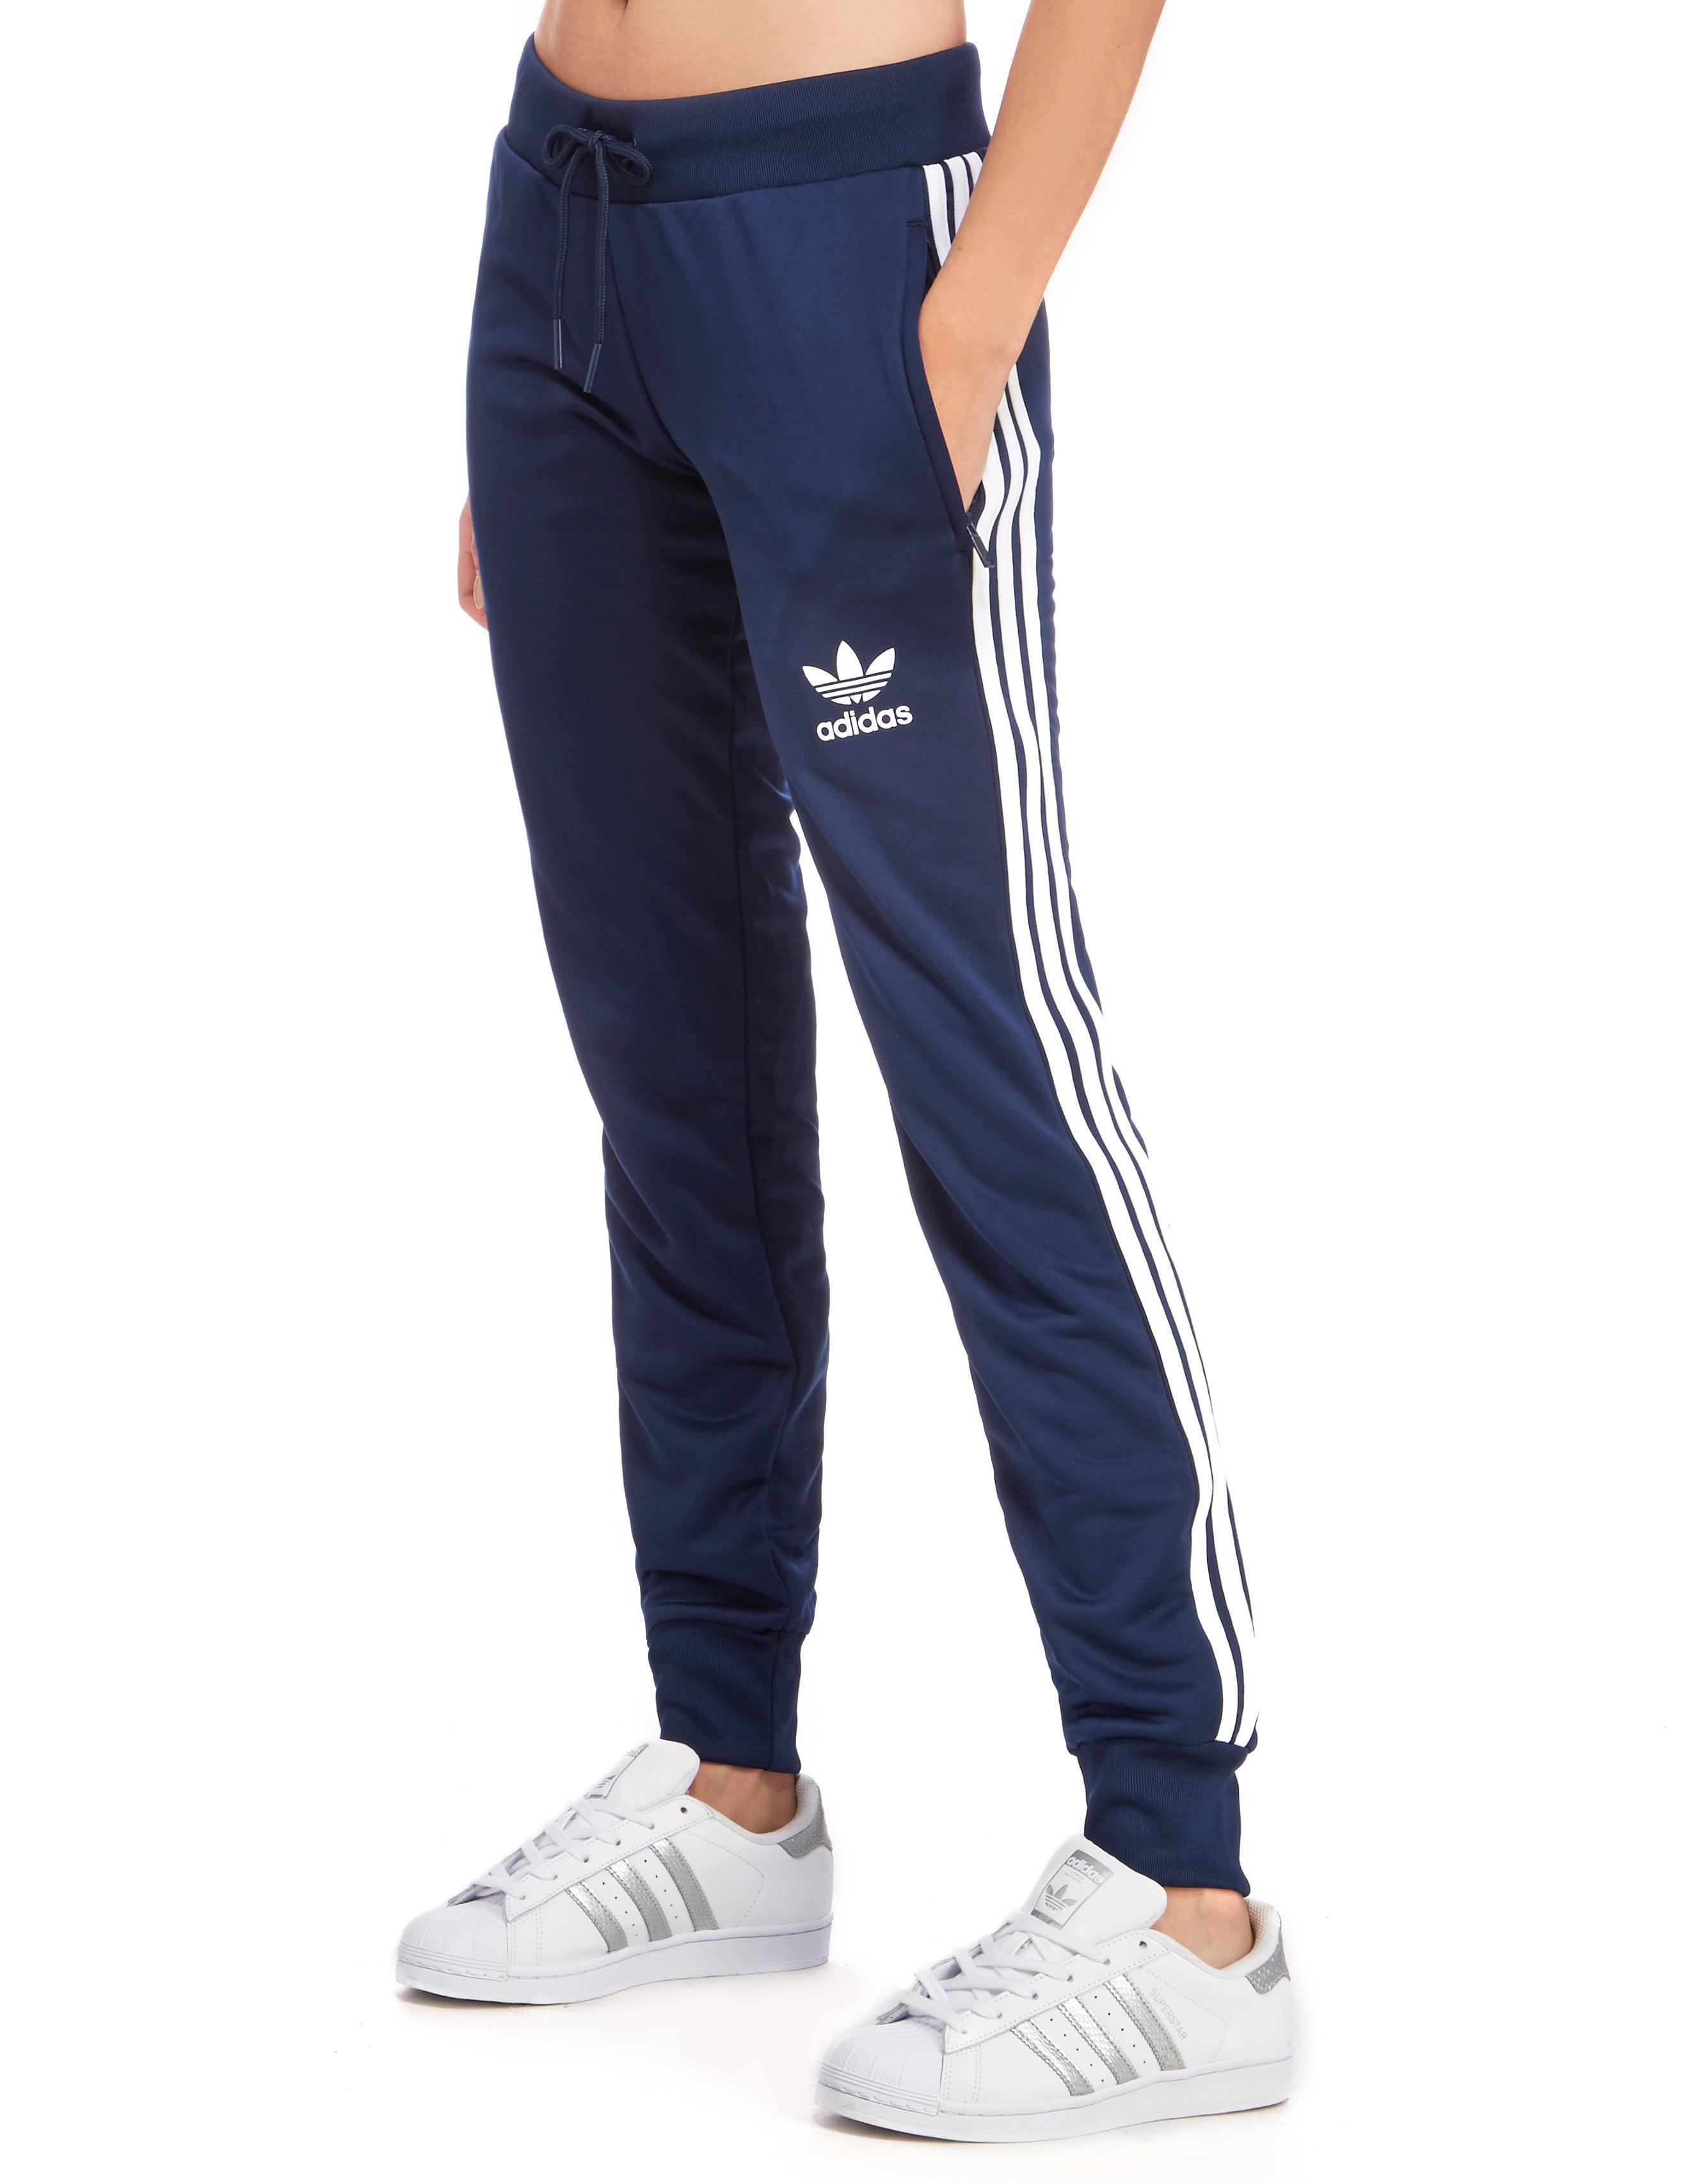 adidas 3 stripes pants blue